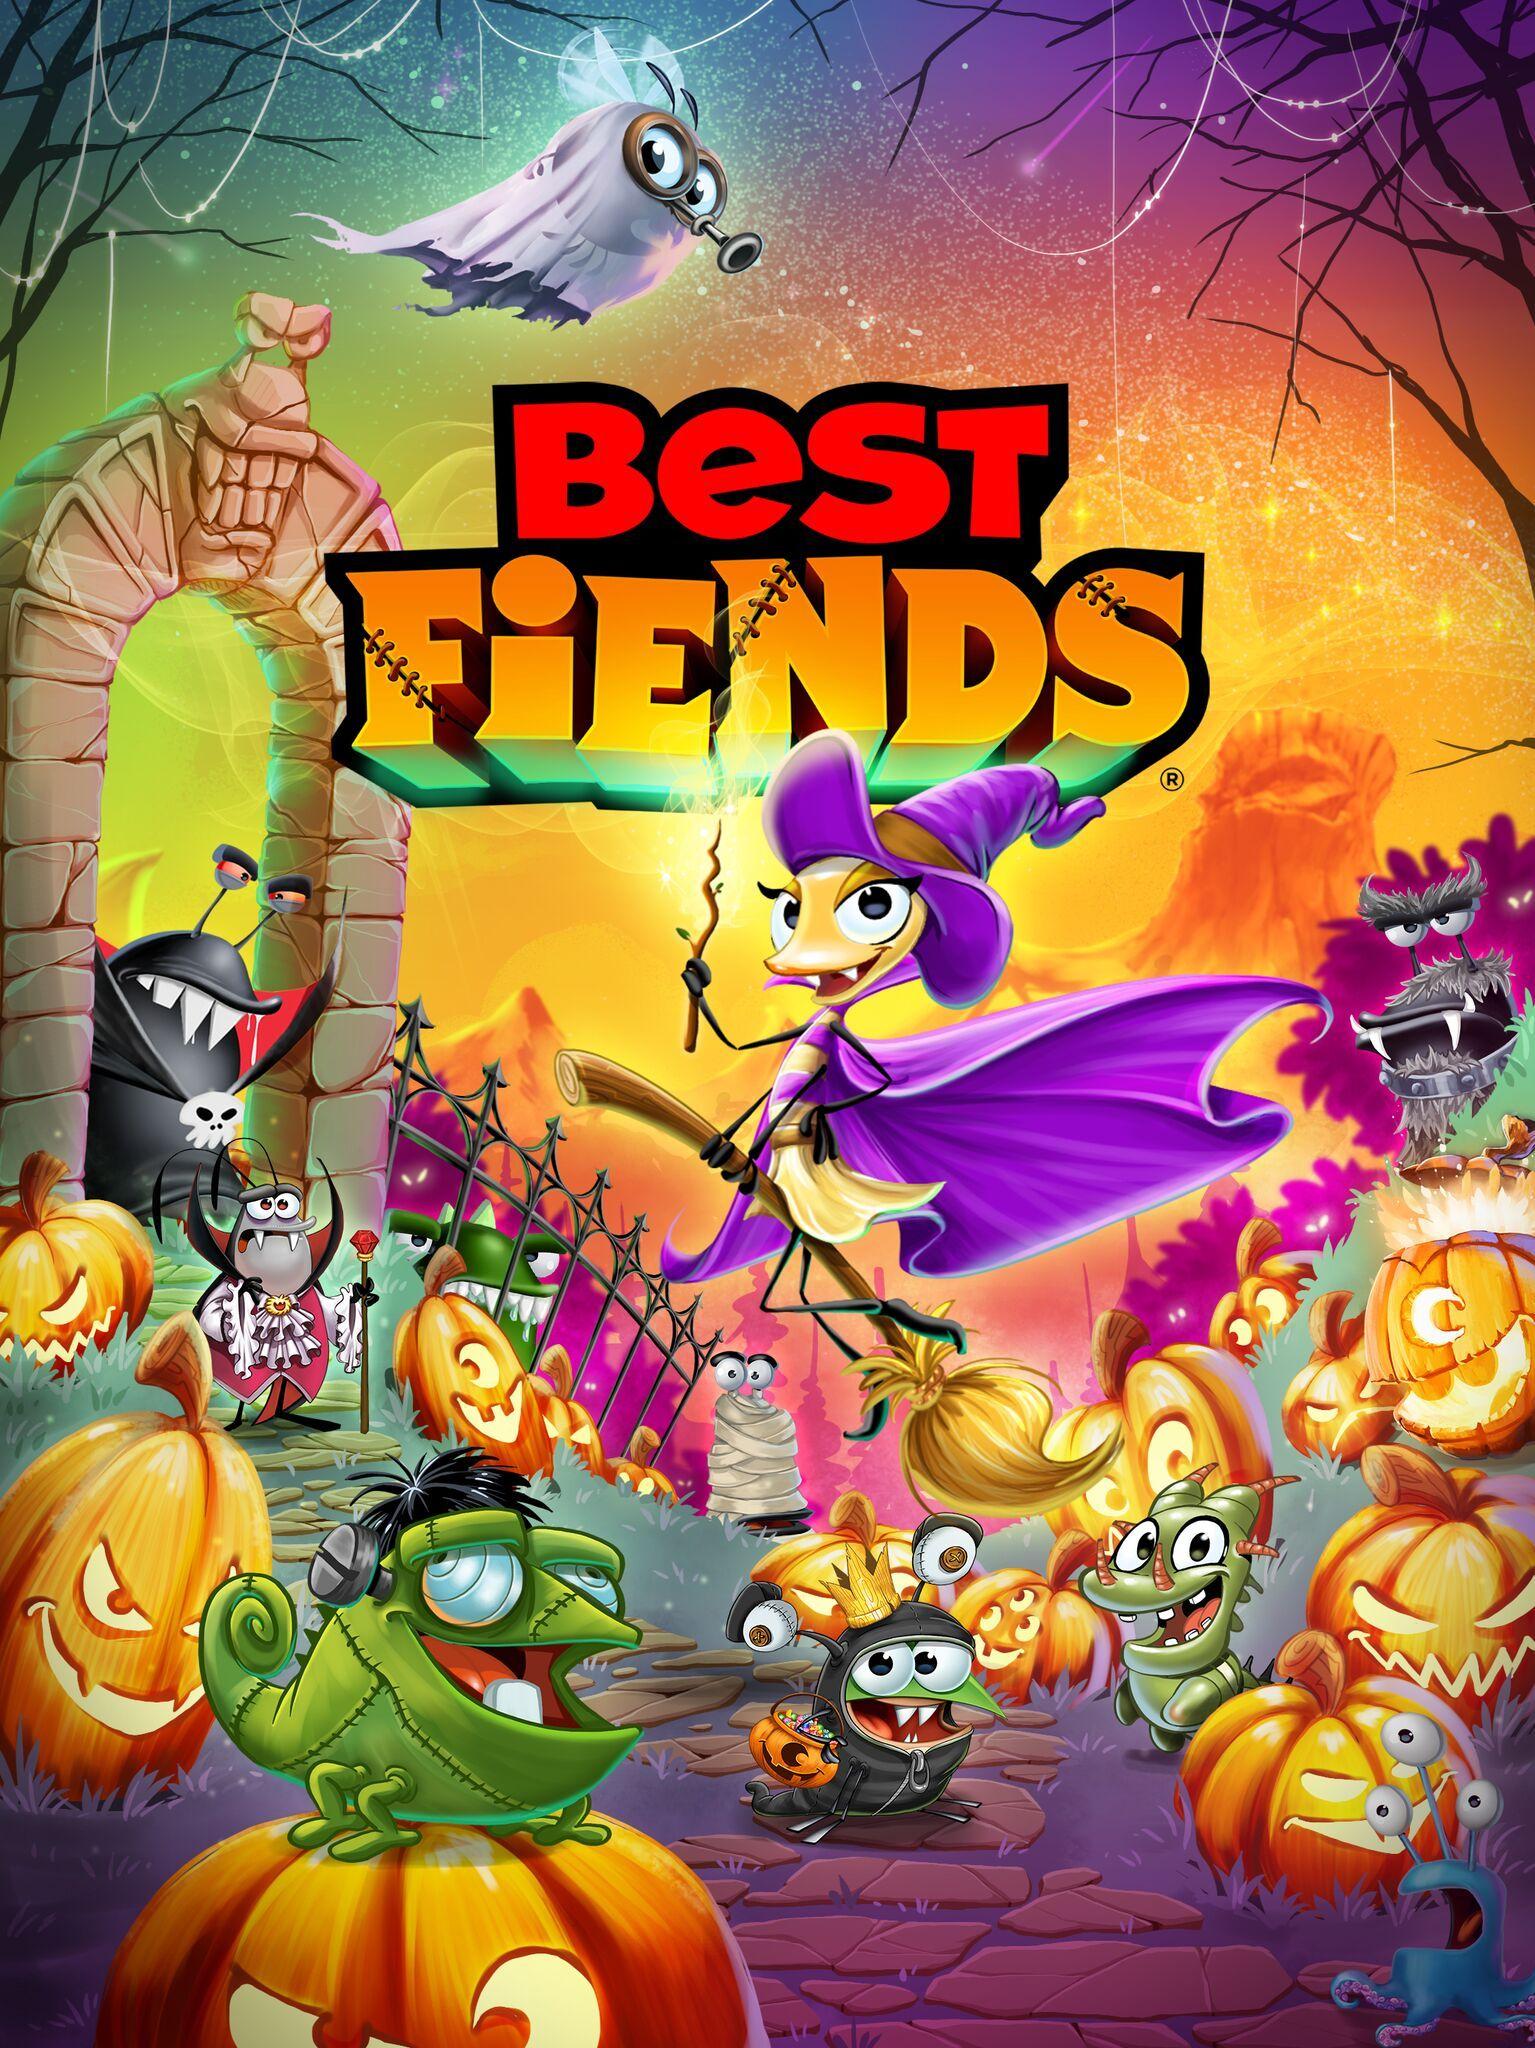 Best fiends halloween 2018 best fiends halloween 2018